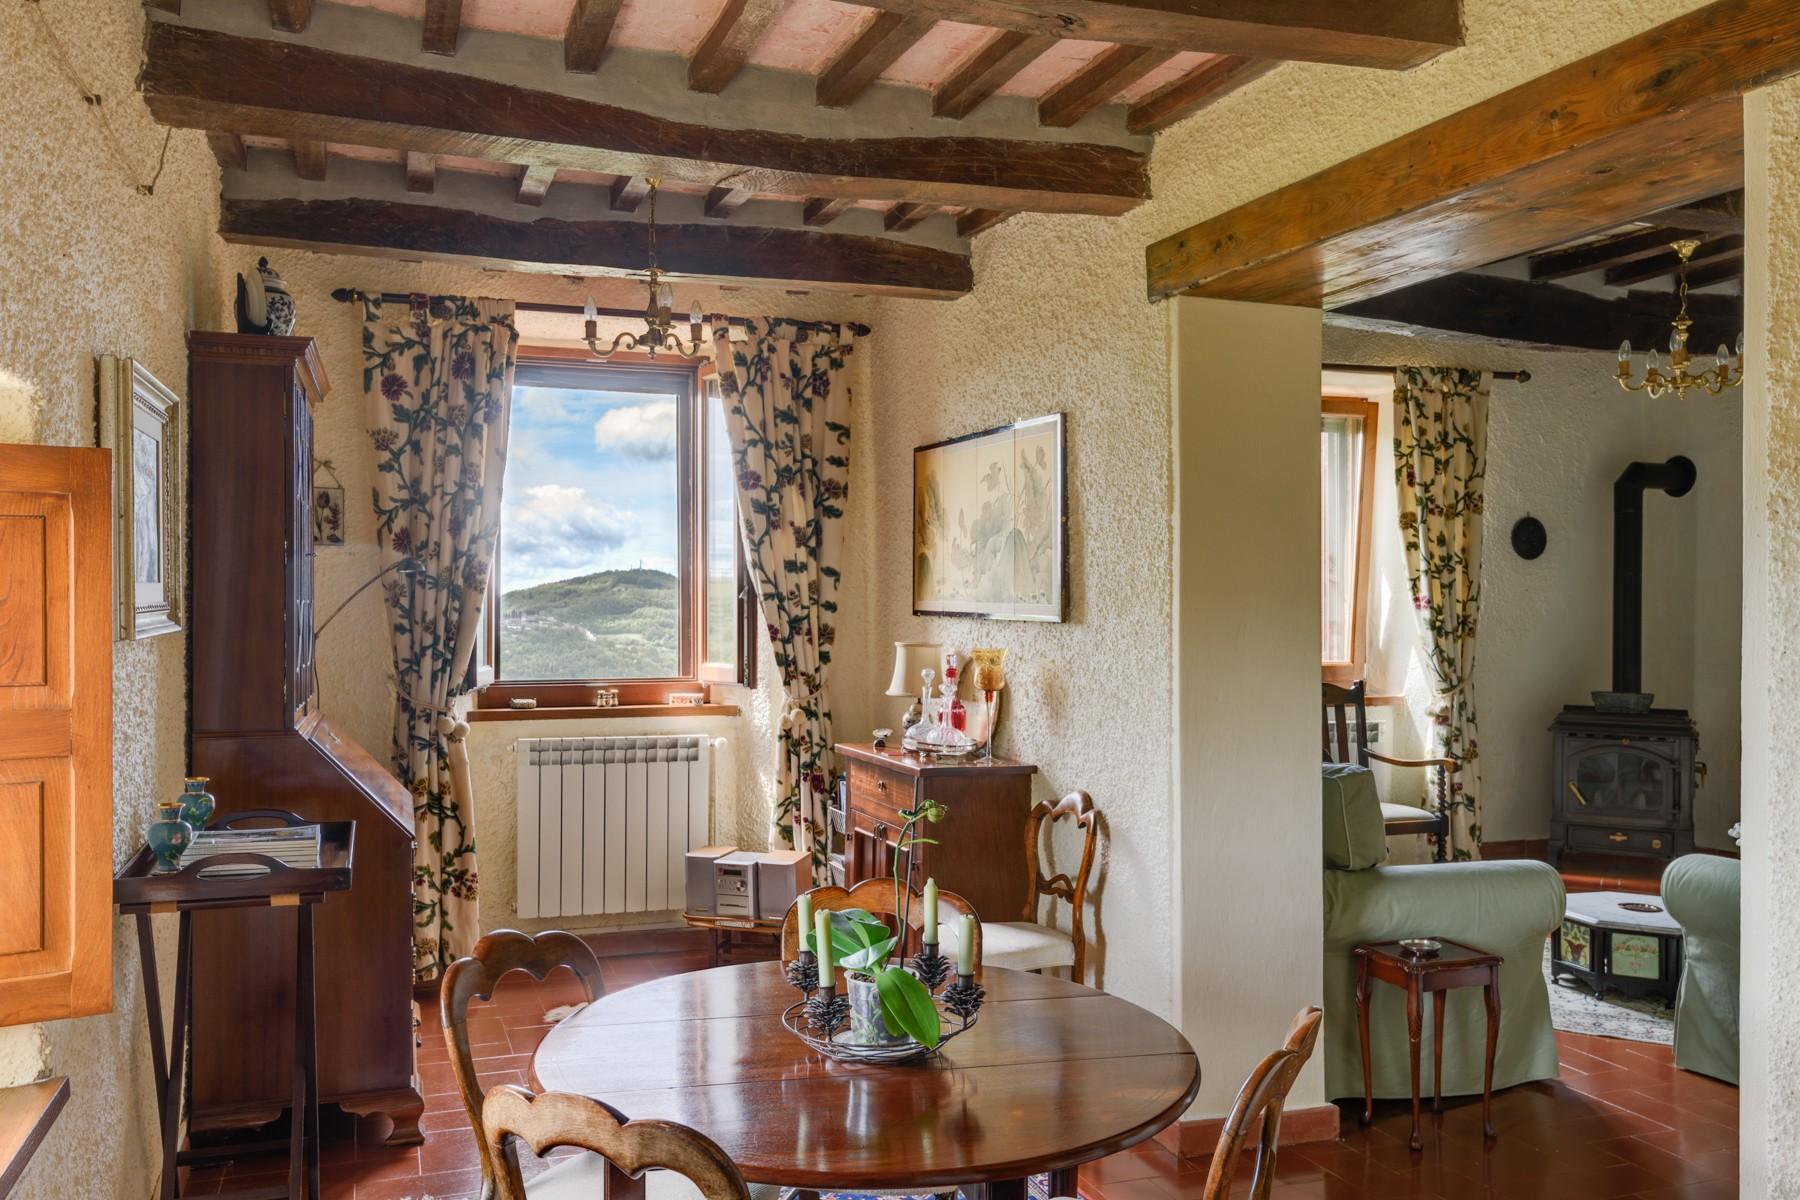 Casa indipendente in Vendita a Semproniano: 4 locali, 220 mq - Foto 9